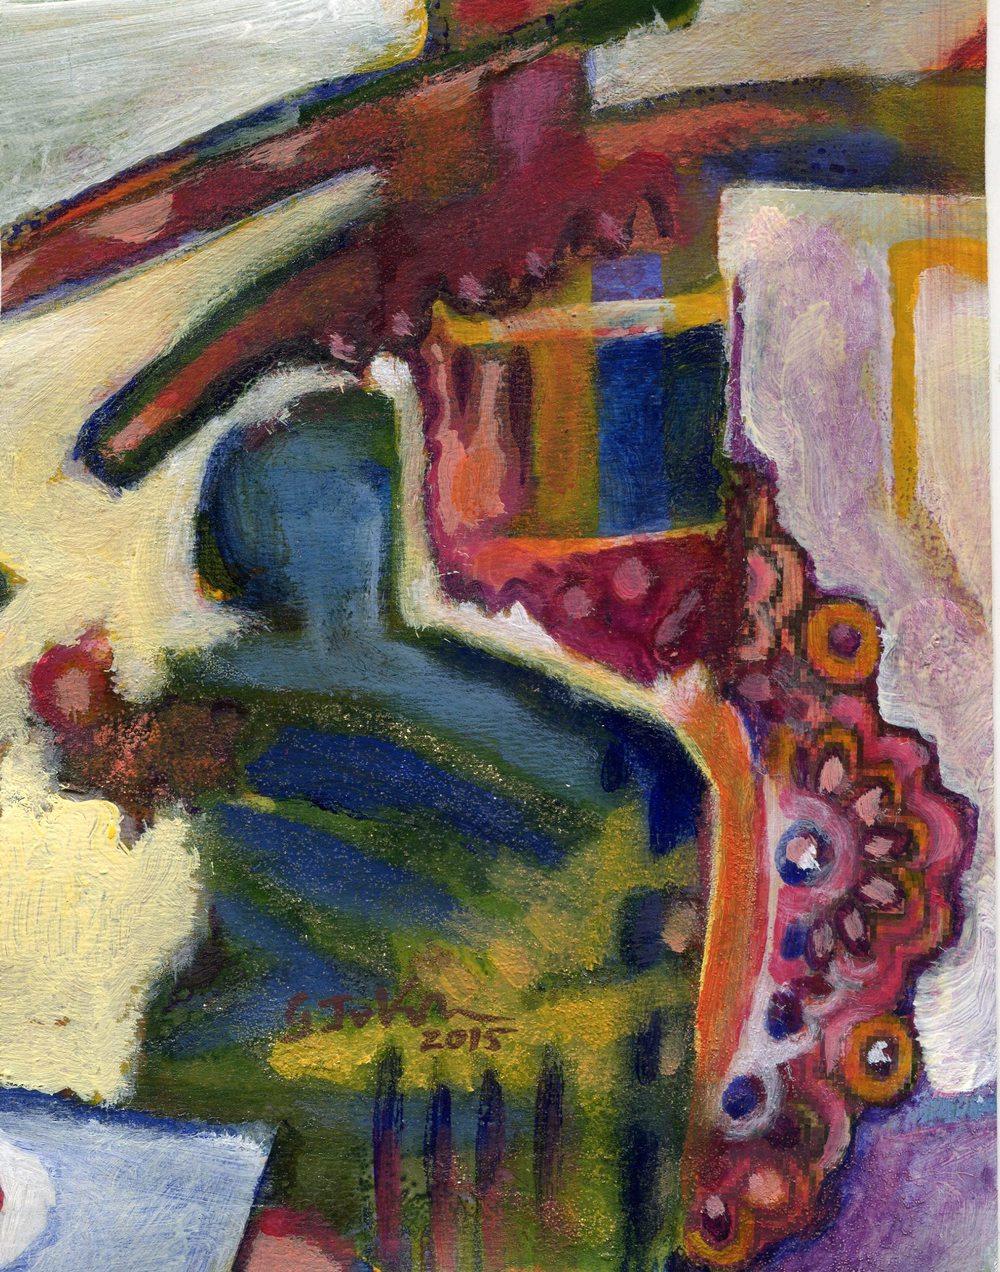 14 Janse van Vuuren, Gerhi-Thinly  on the Edge, Mixed media.jpg